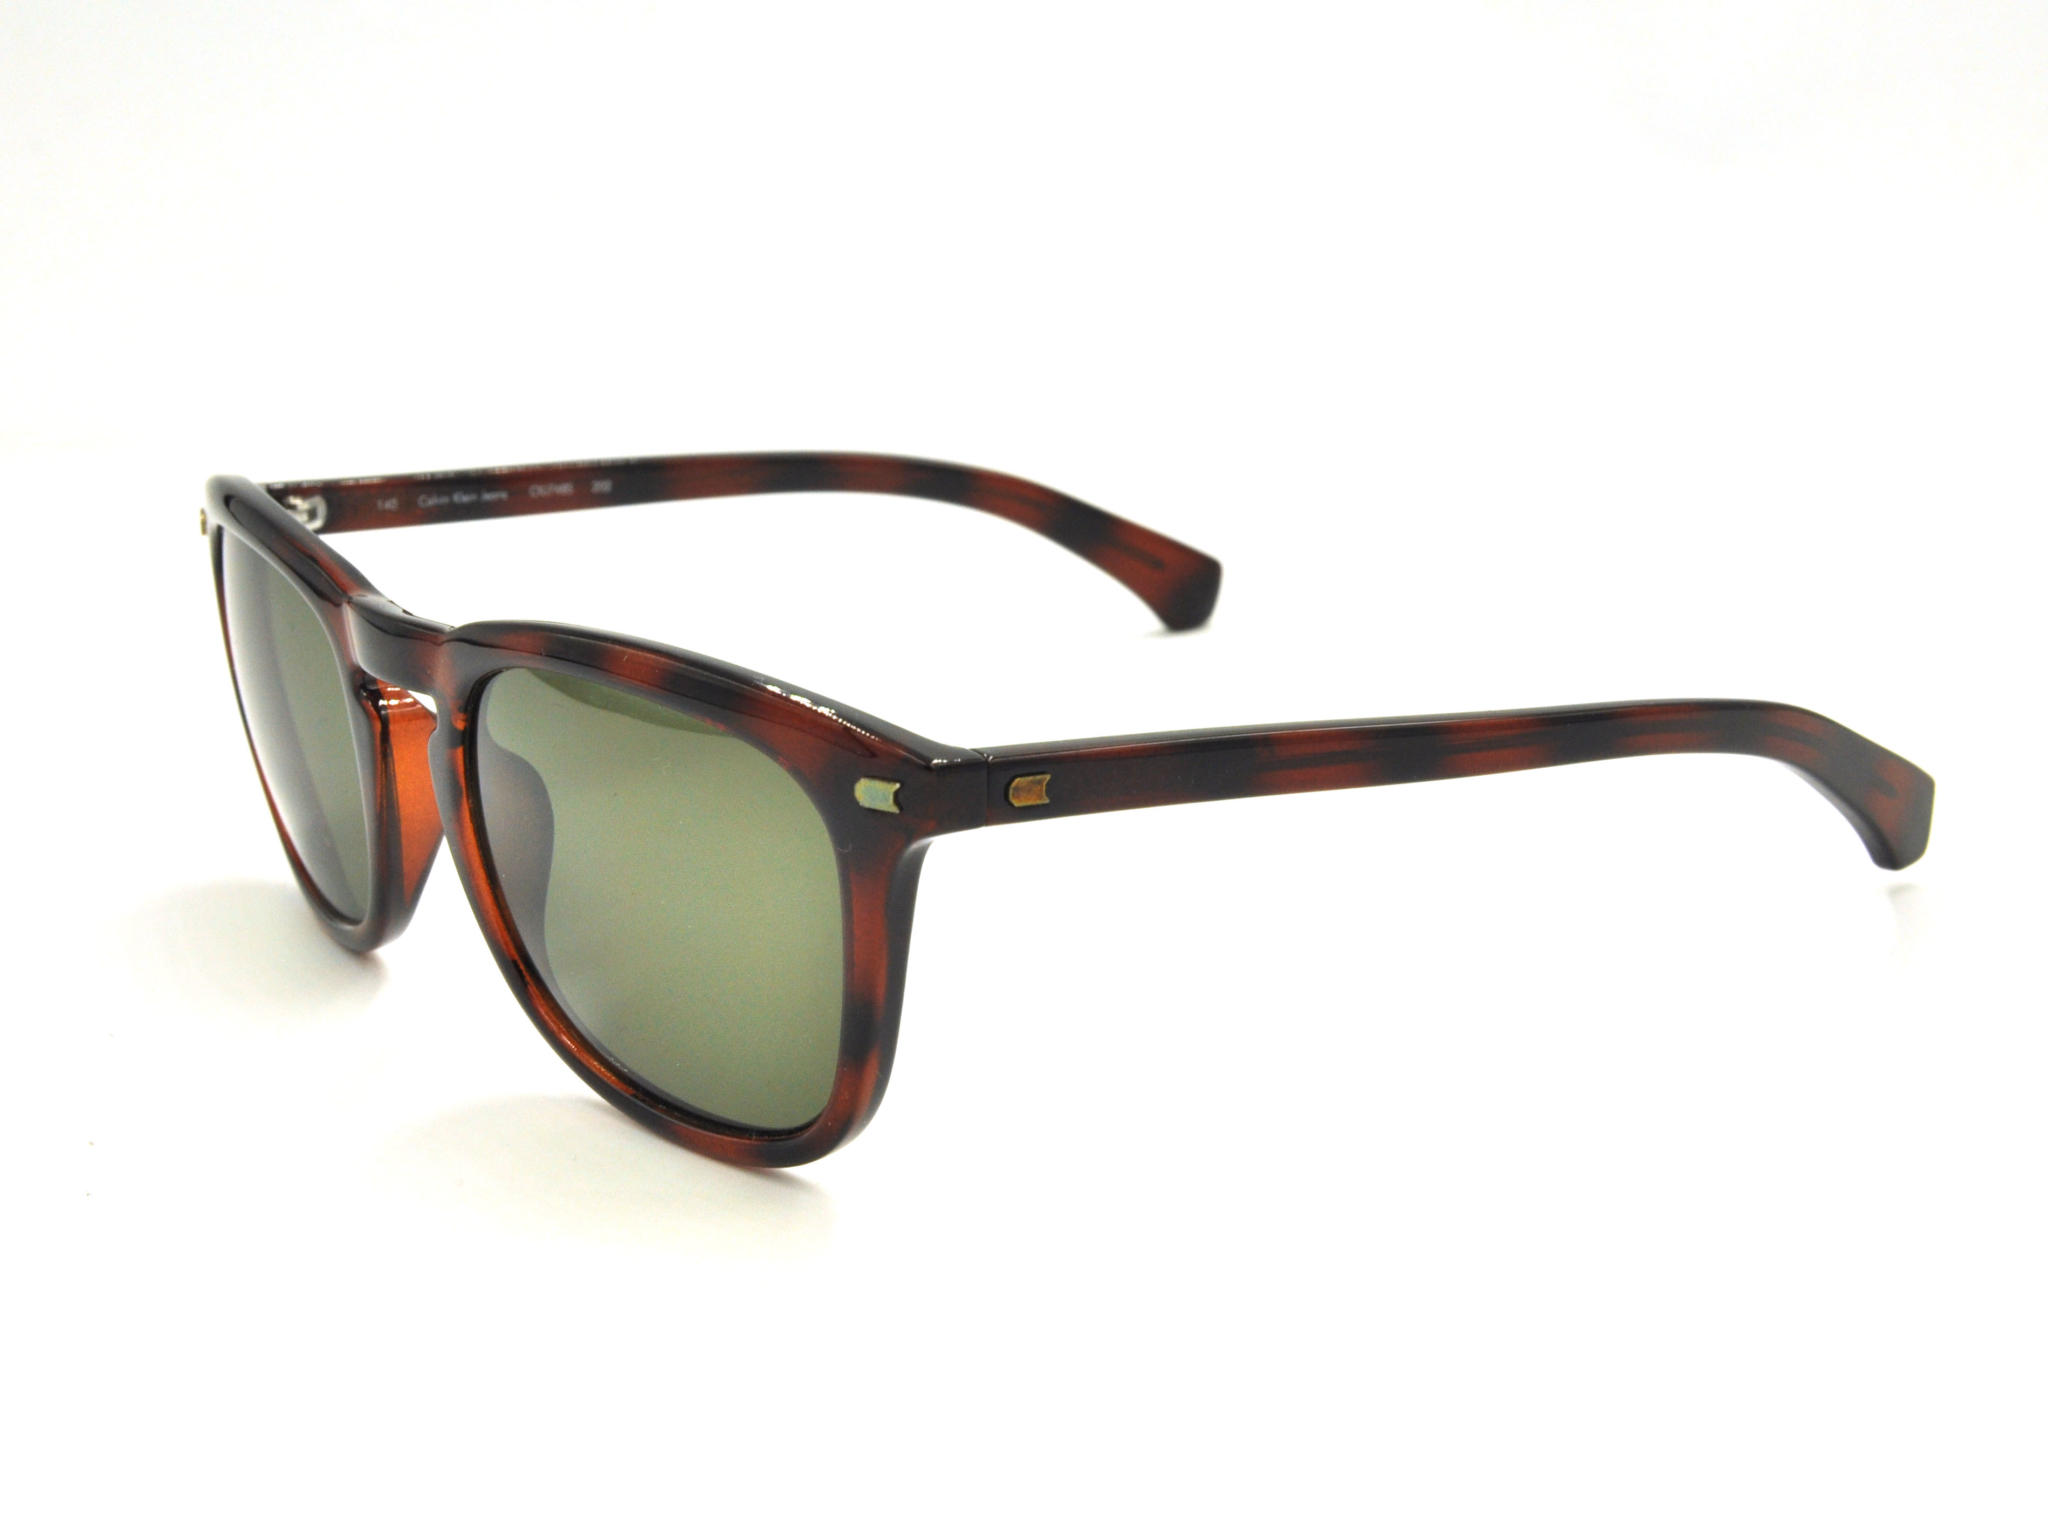 CALVIN KLEIN CKJ748S 202 Sunglasses 2020